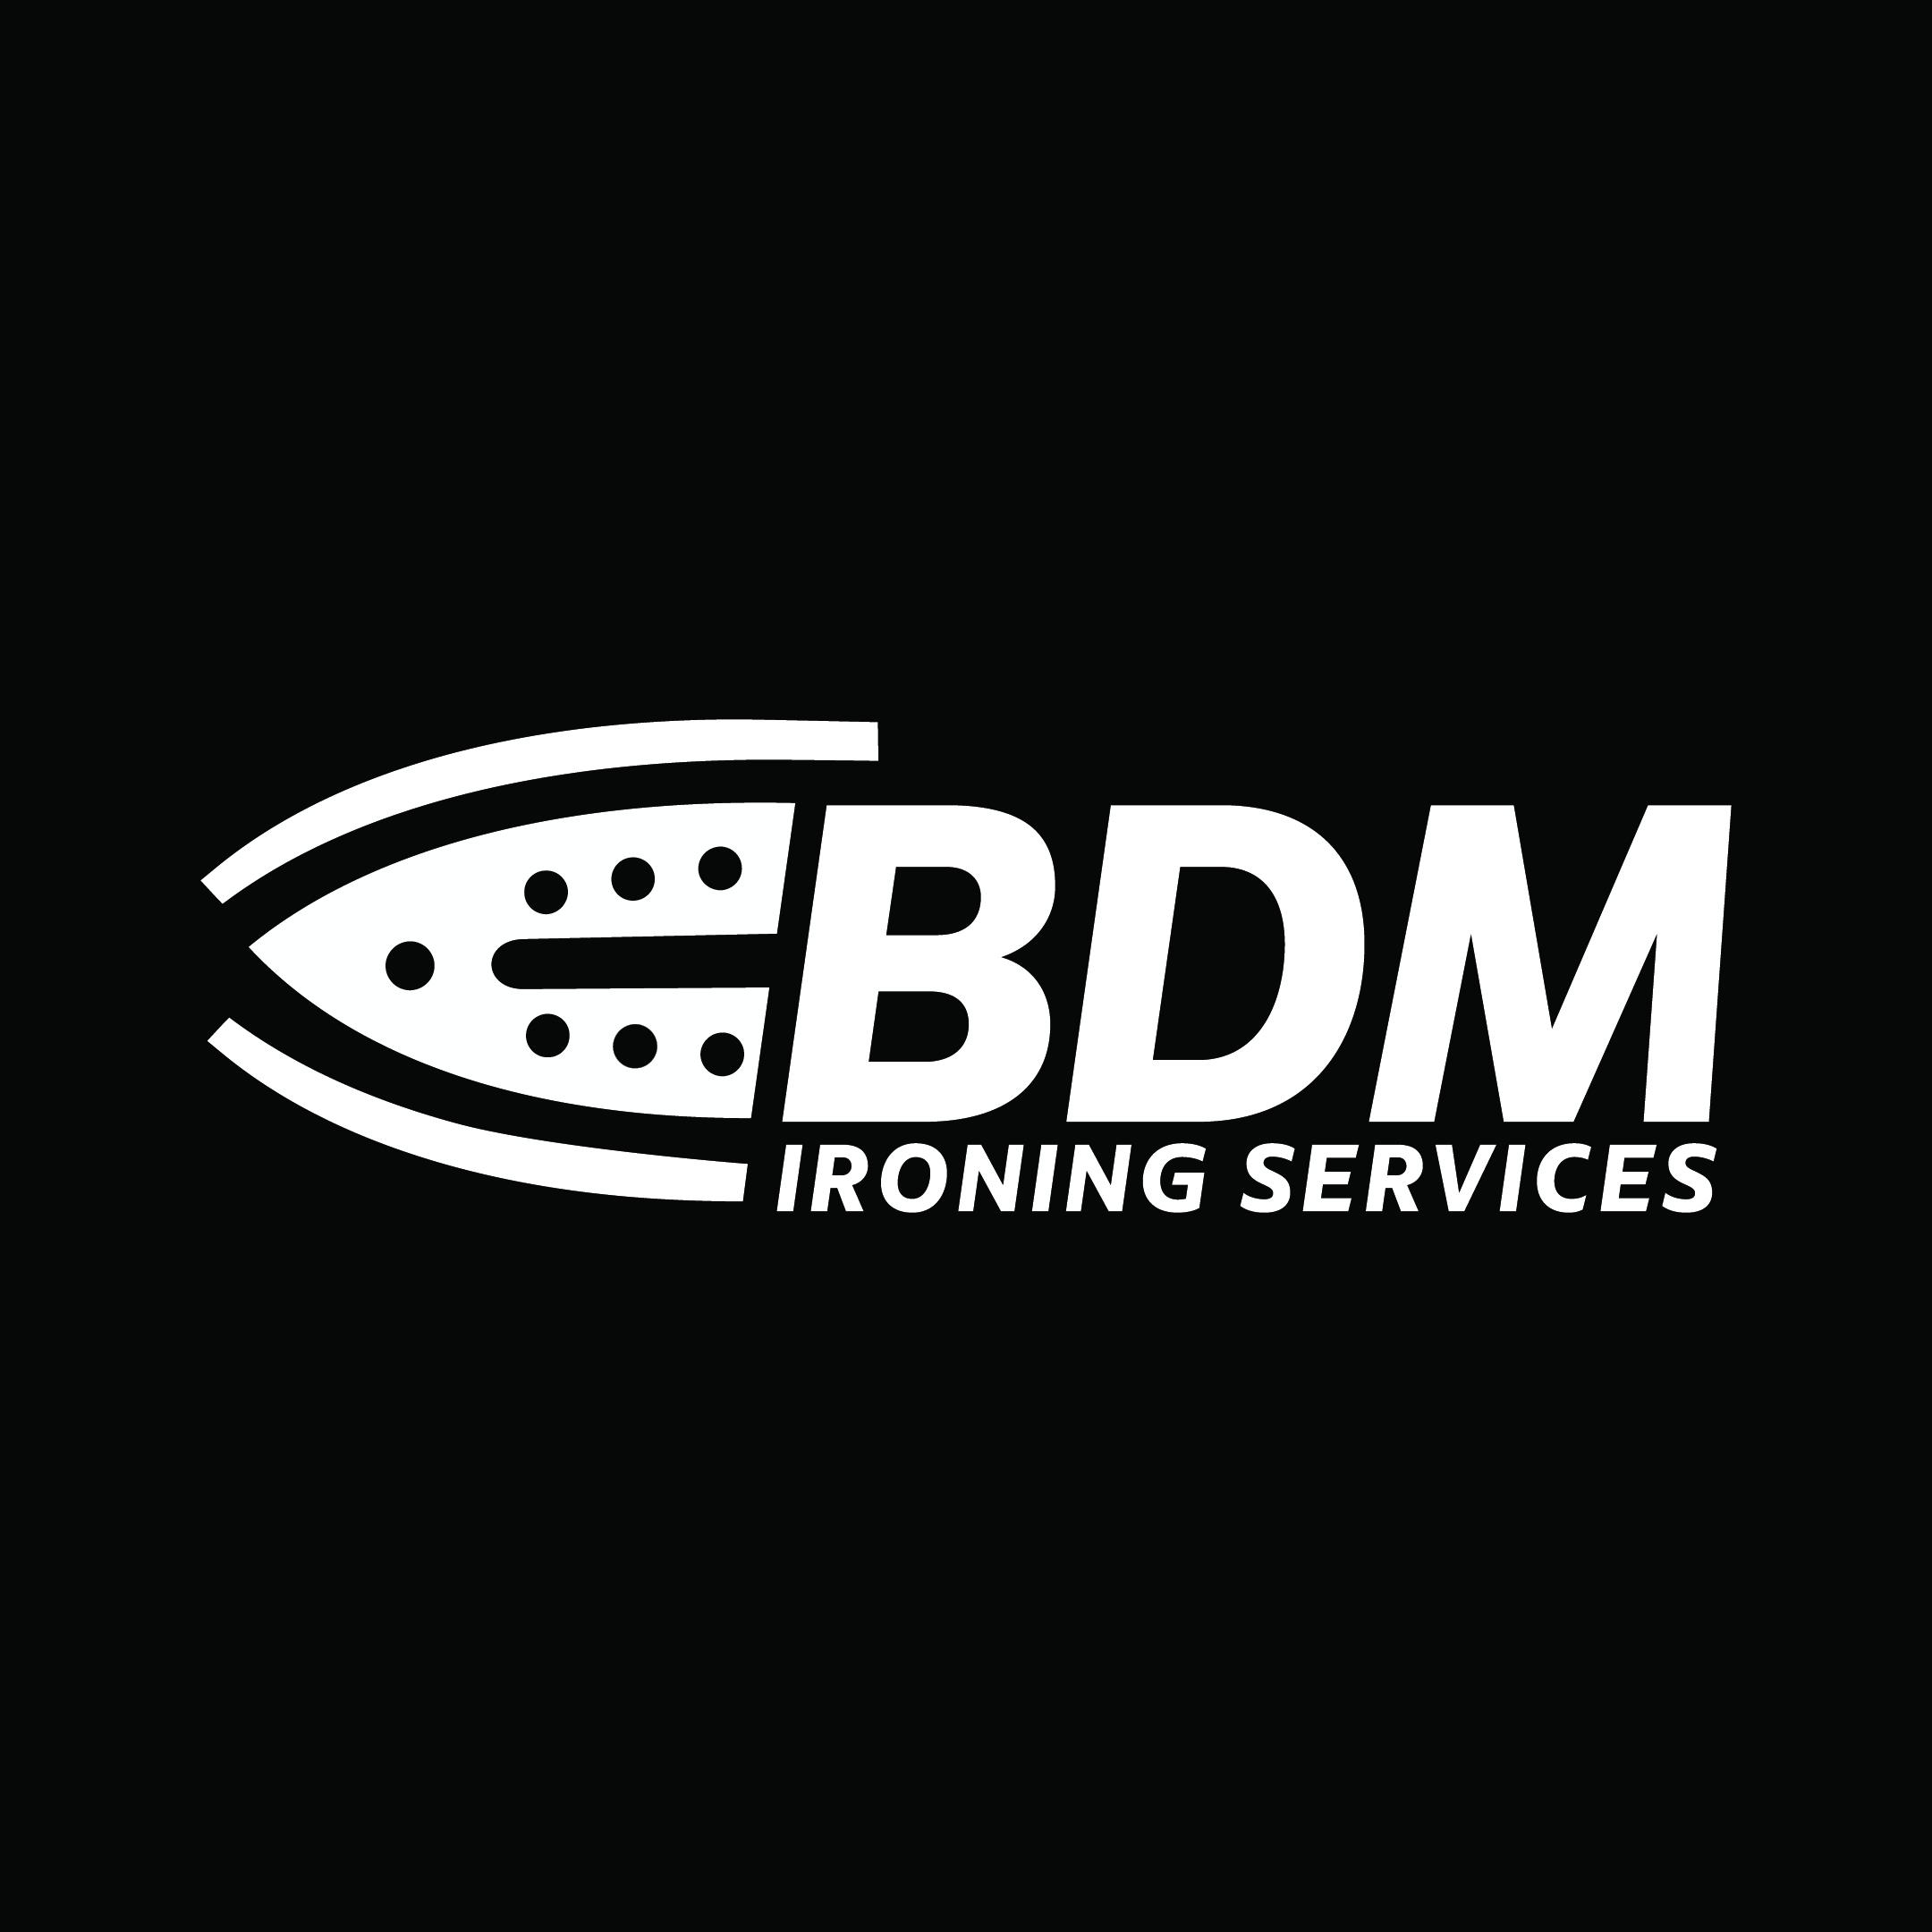 BDM Ironing Services